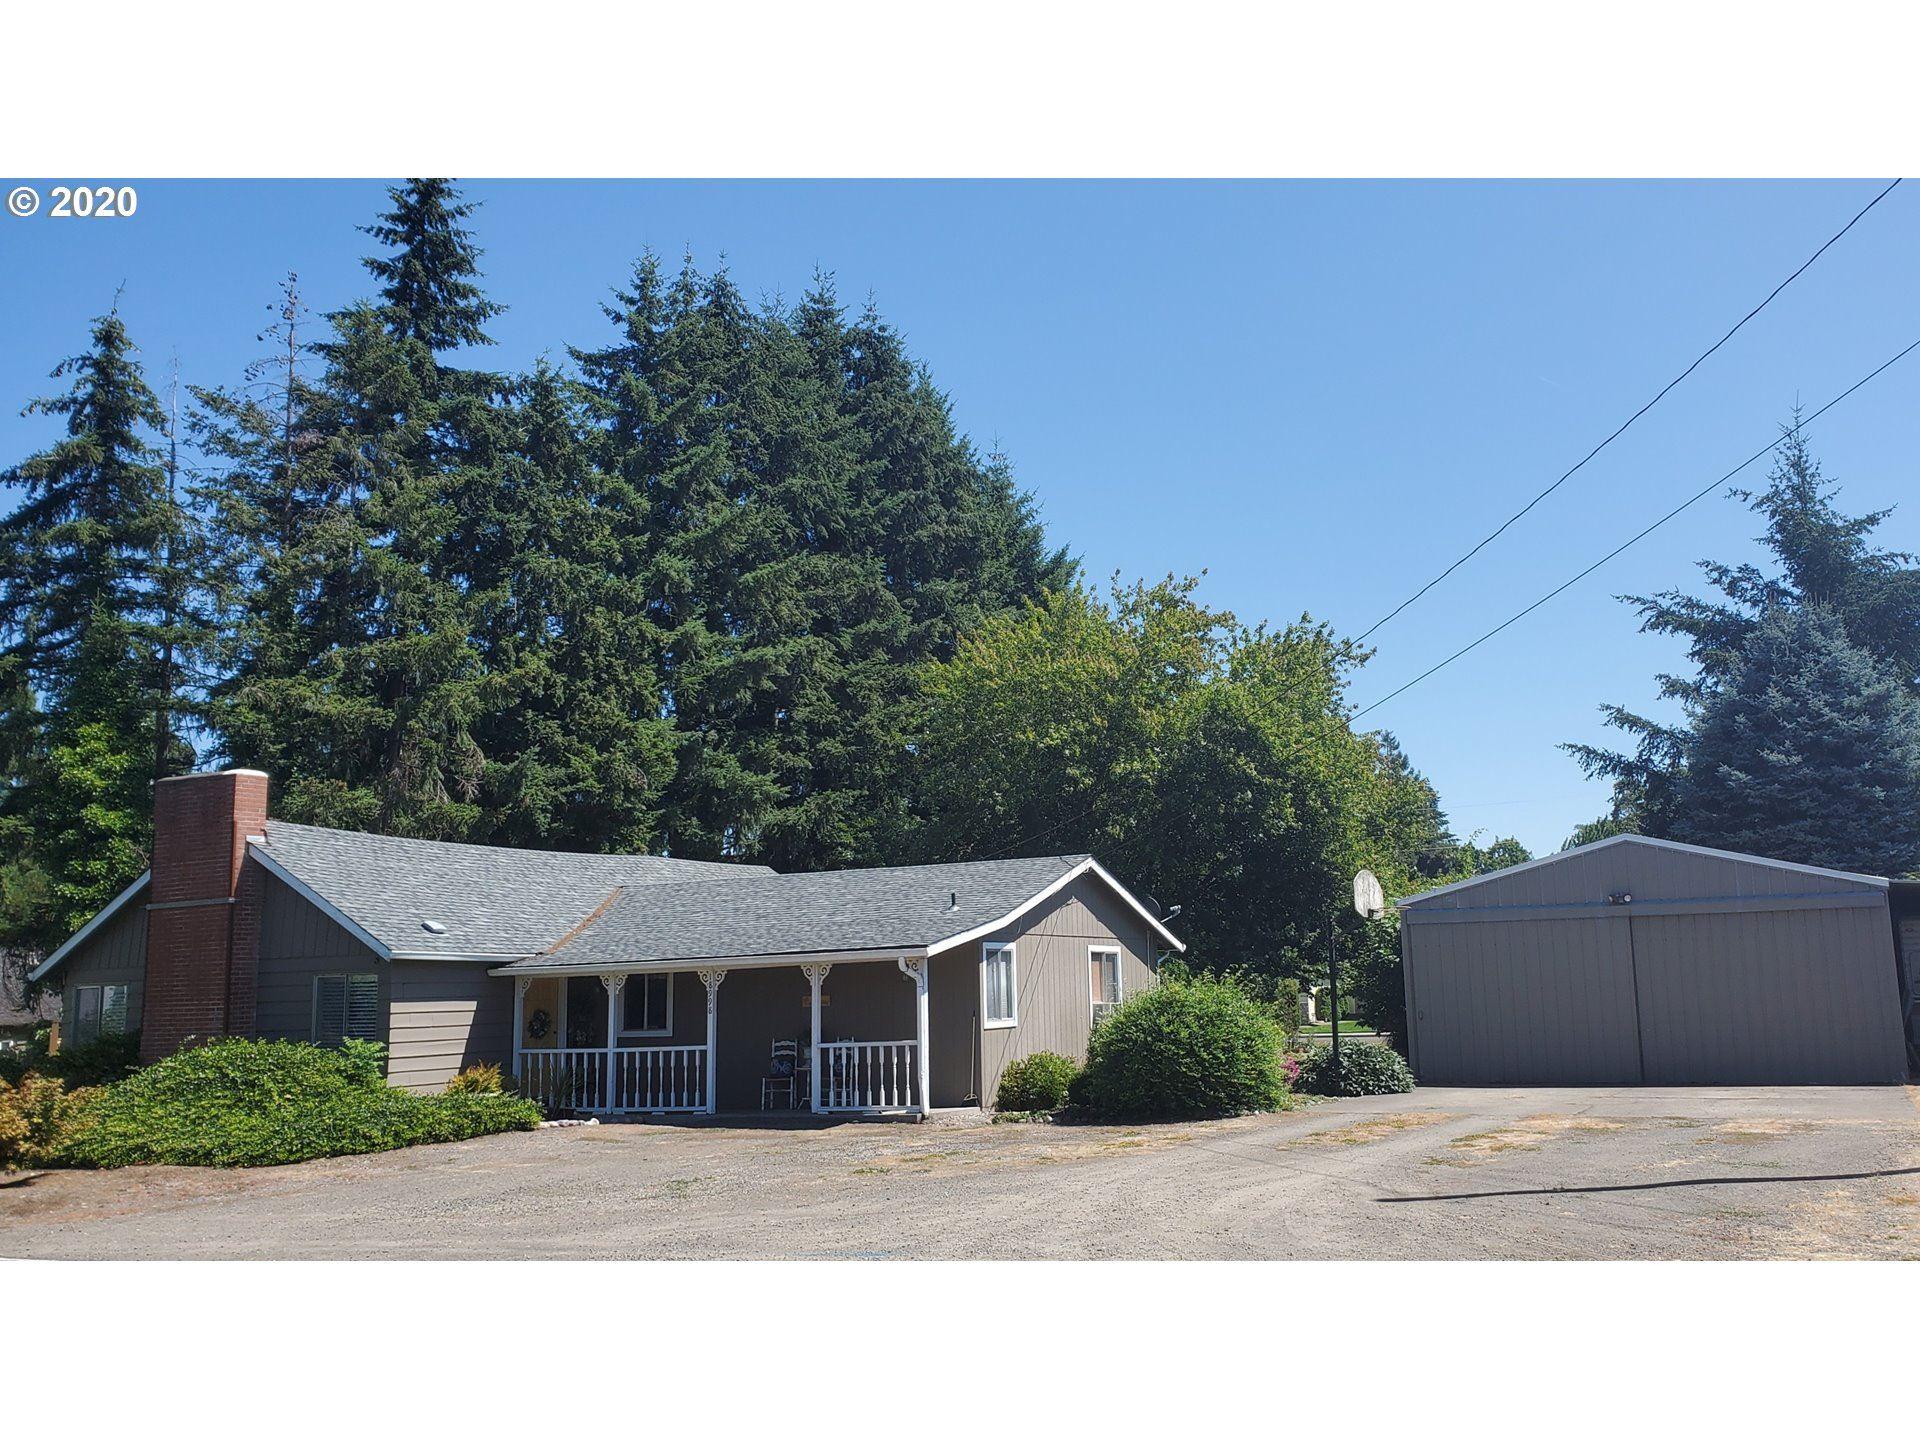 18998 Pease RD, Oregon City, OR 97045 - MLS#: 20206566